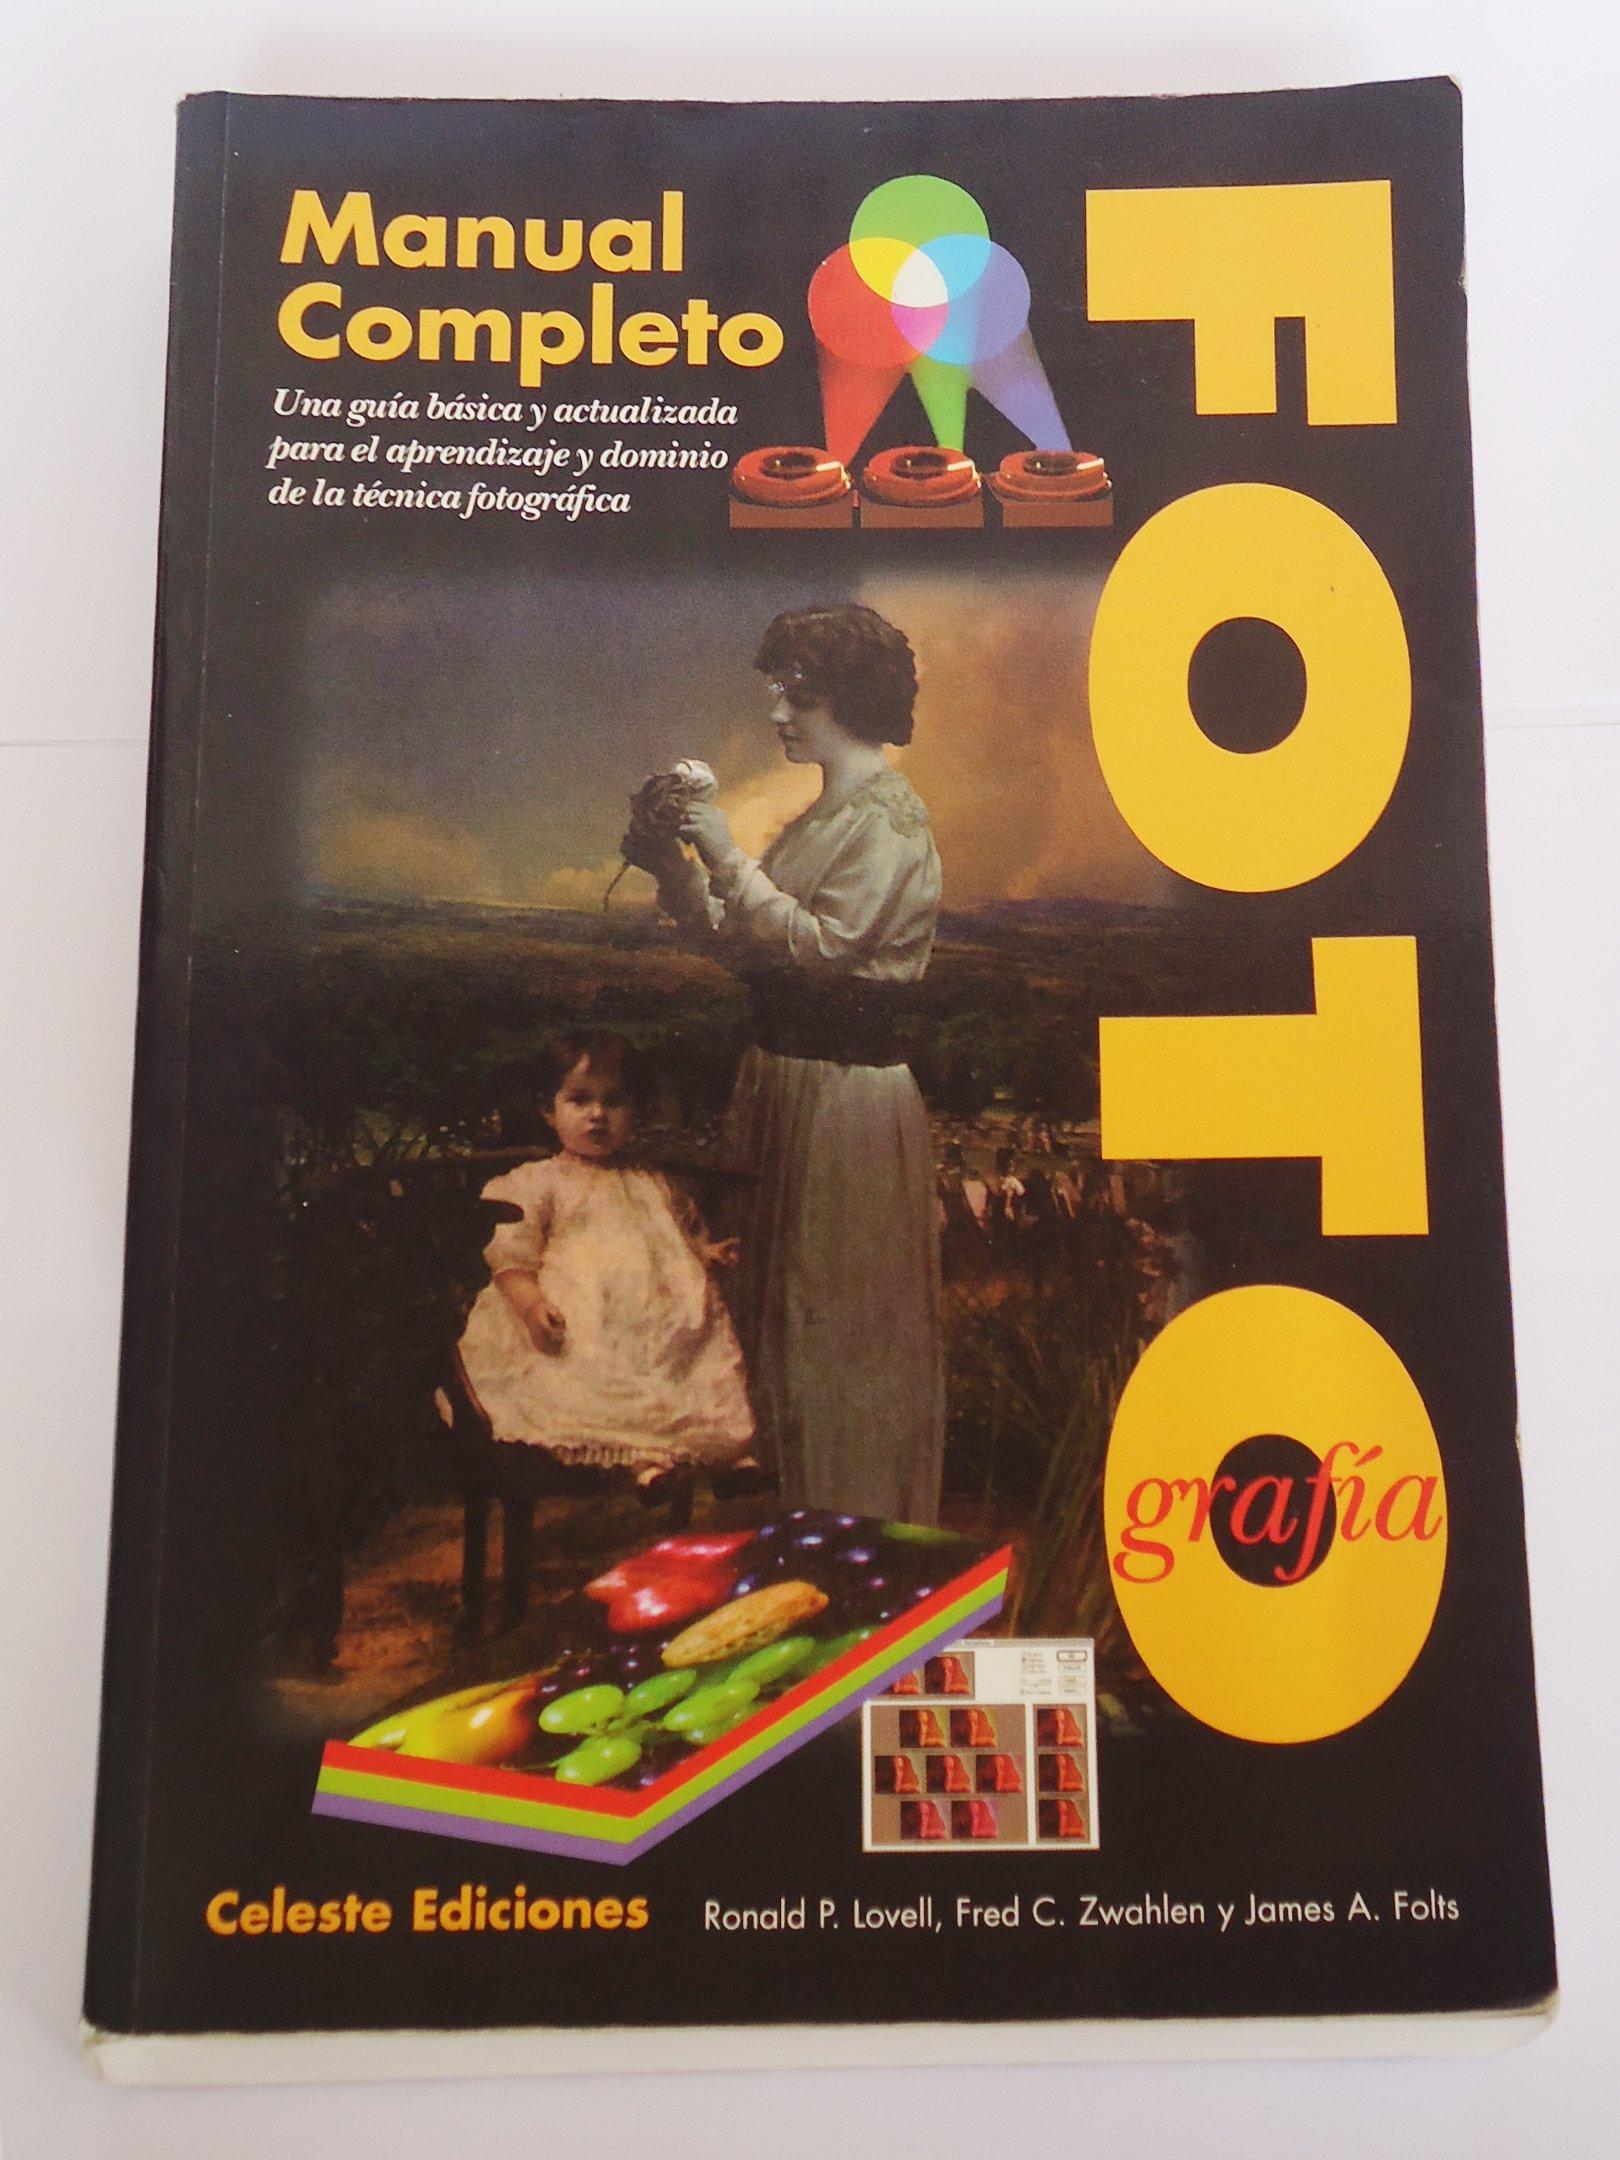 Manual completo de fotografia: Amazon.es: Ronald P. Lovell, Fred C. Wahlen, James A. Folts: Libros